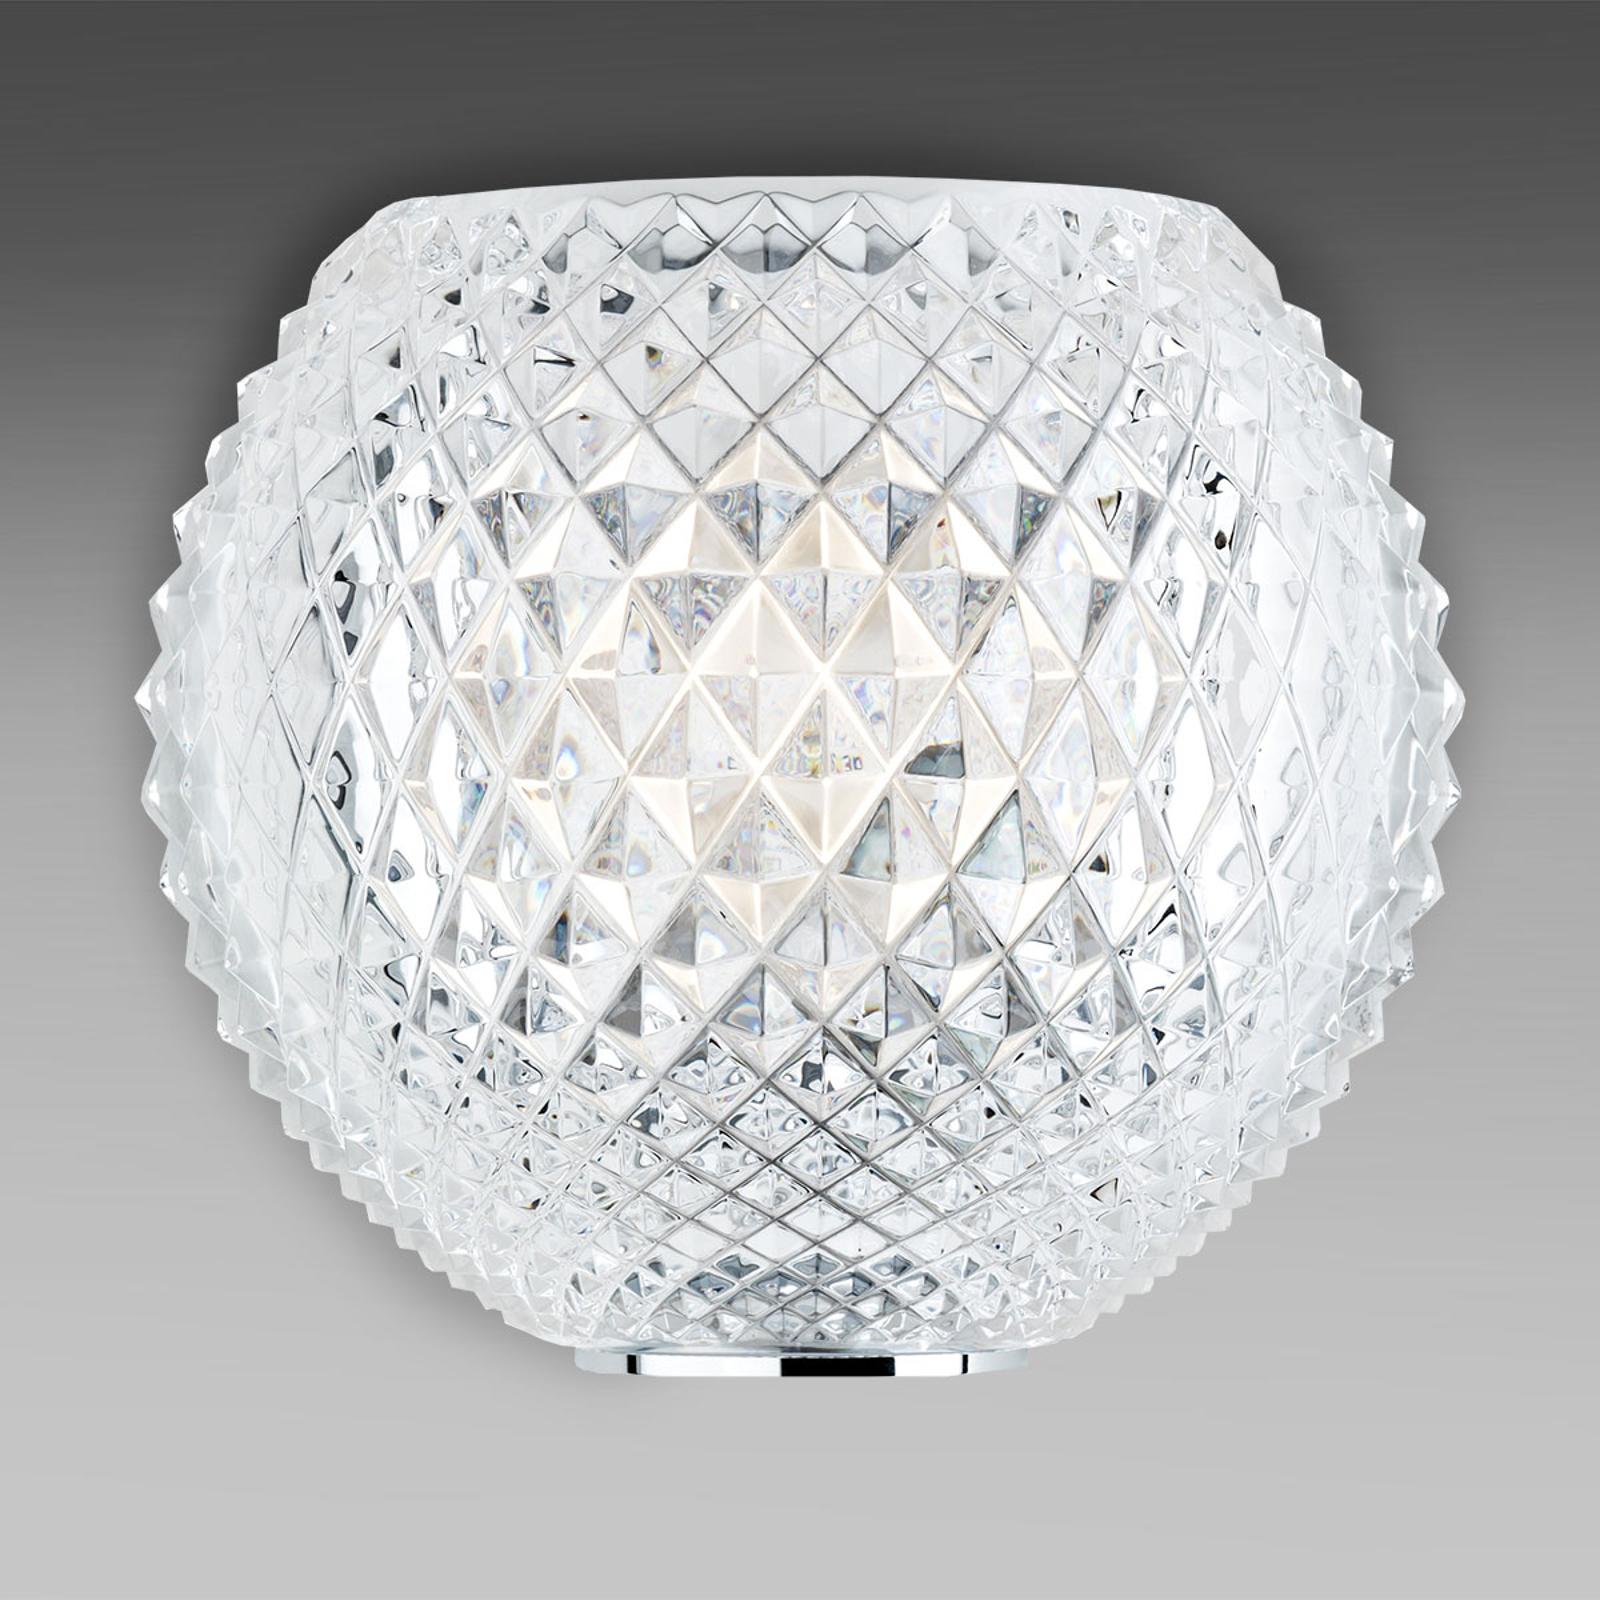 Patterned Diamond and Swirl crystal wall light_3503177_1